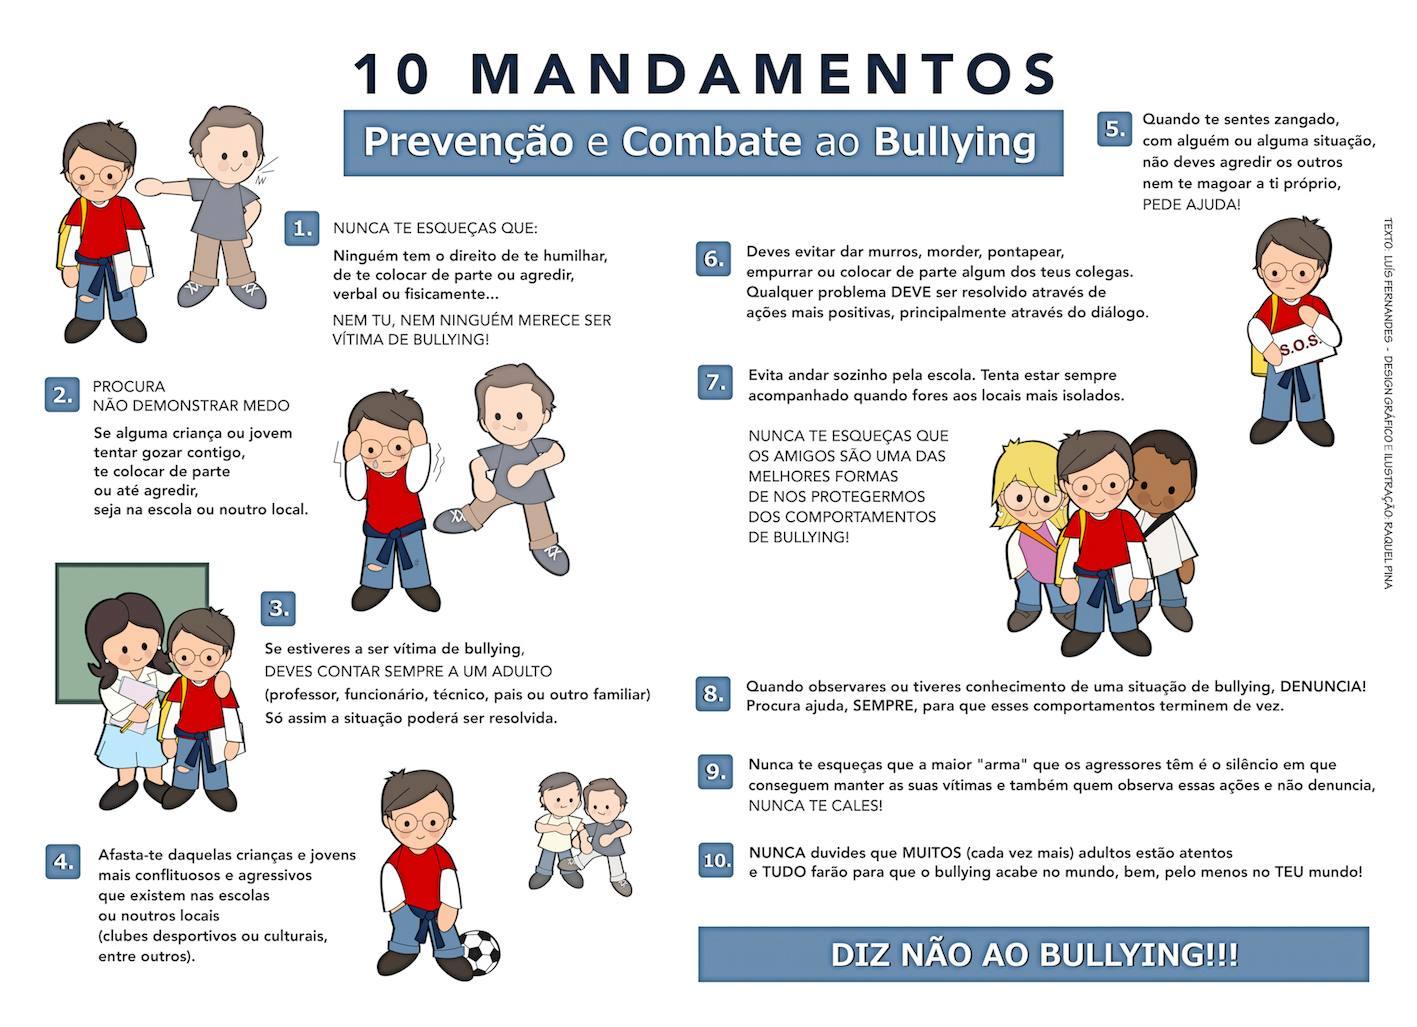 10 Mandamentos Antibullying